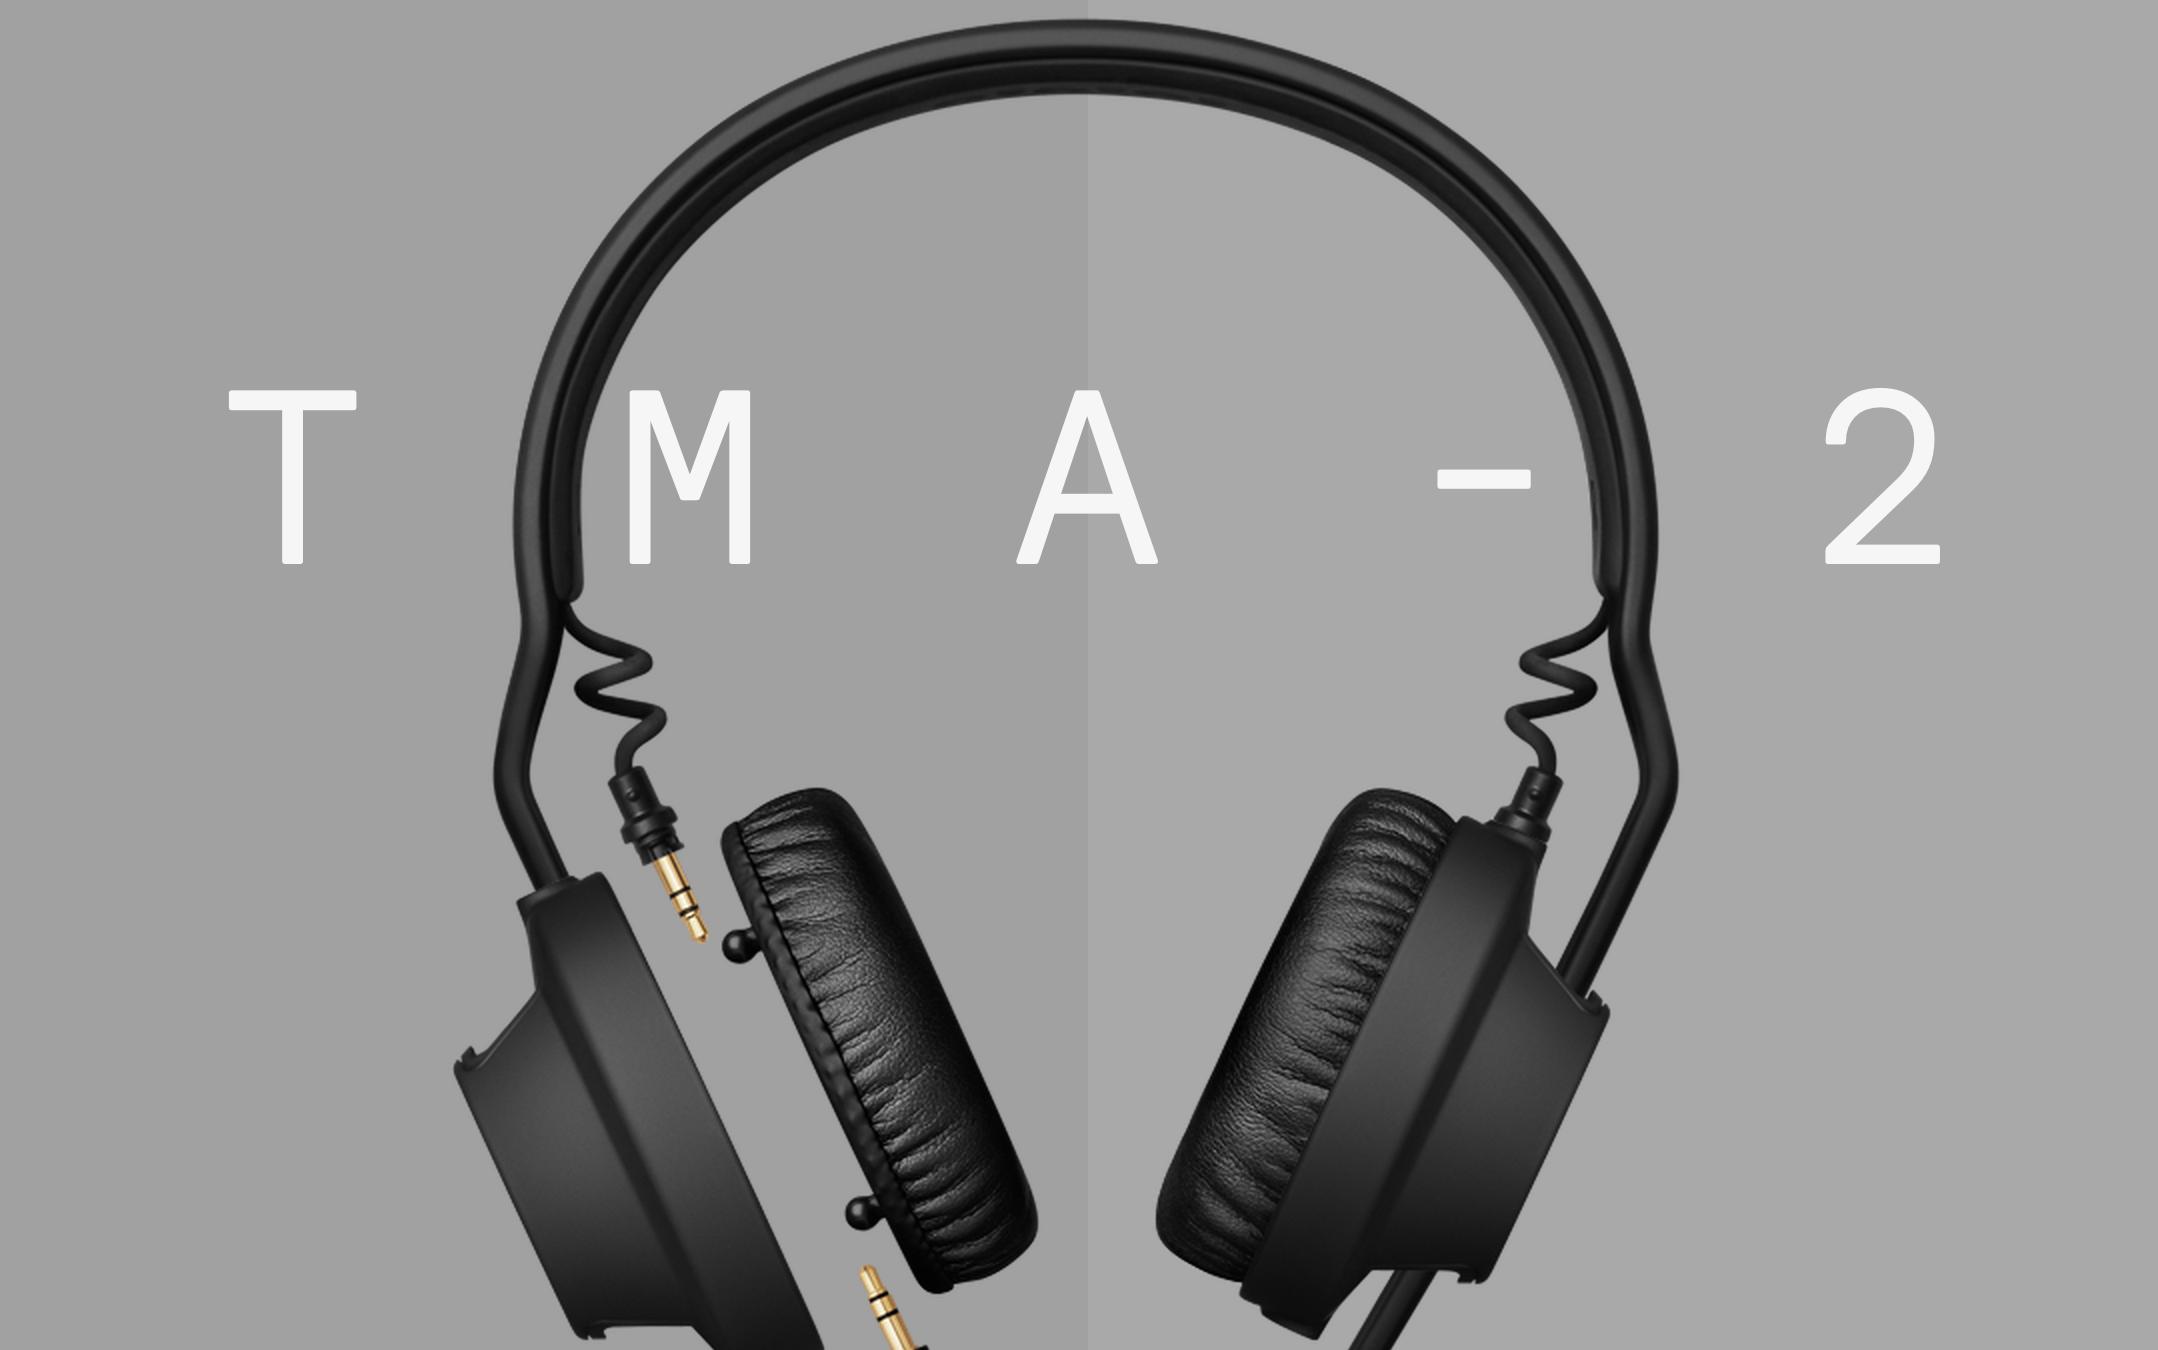 6e2a8a6a_tma-2-aiaiai-new-modular-headphones-04